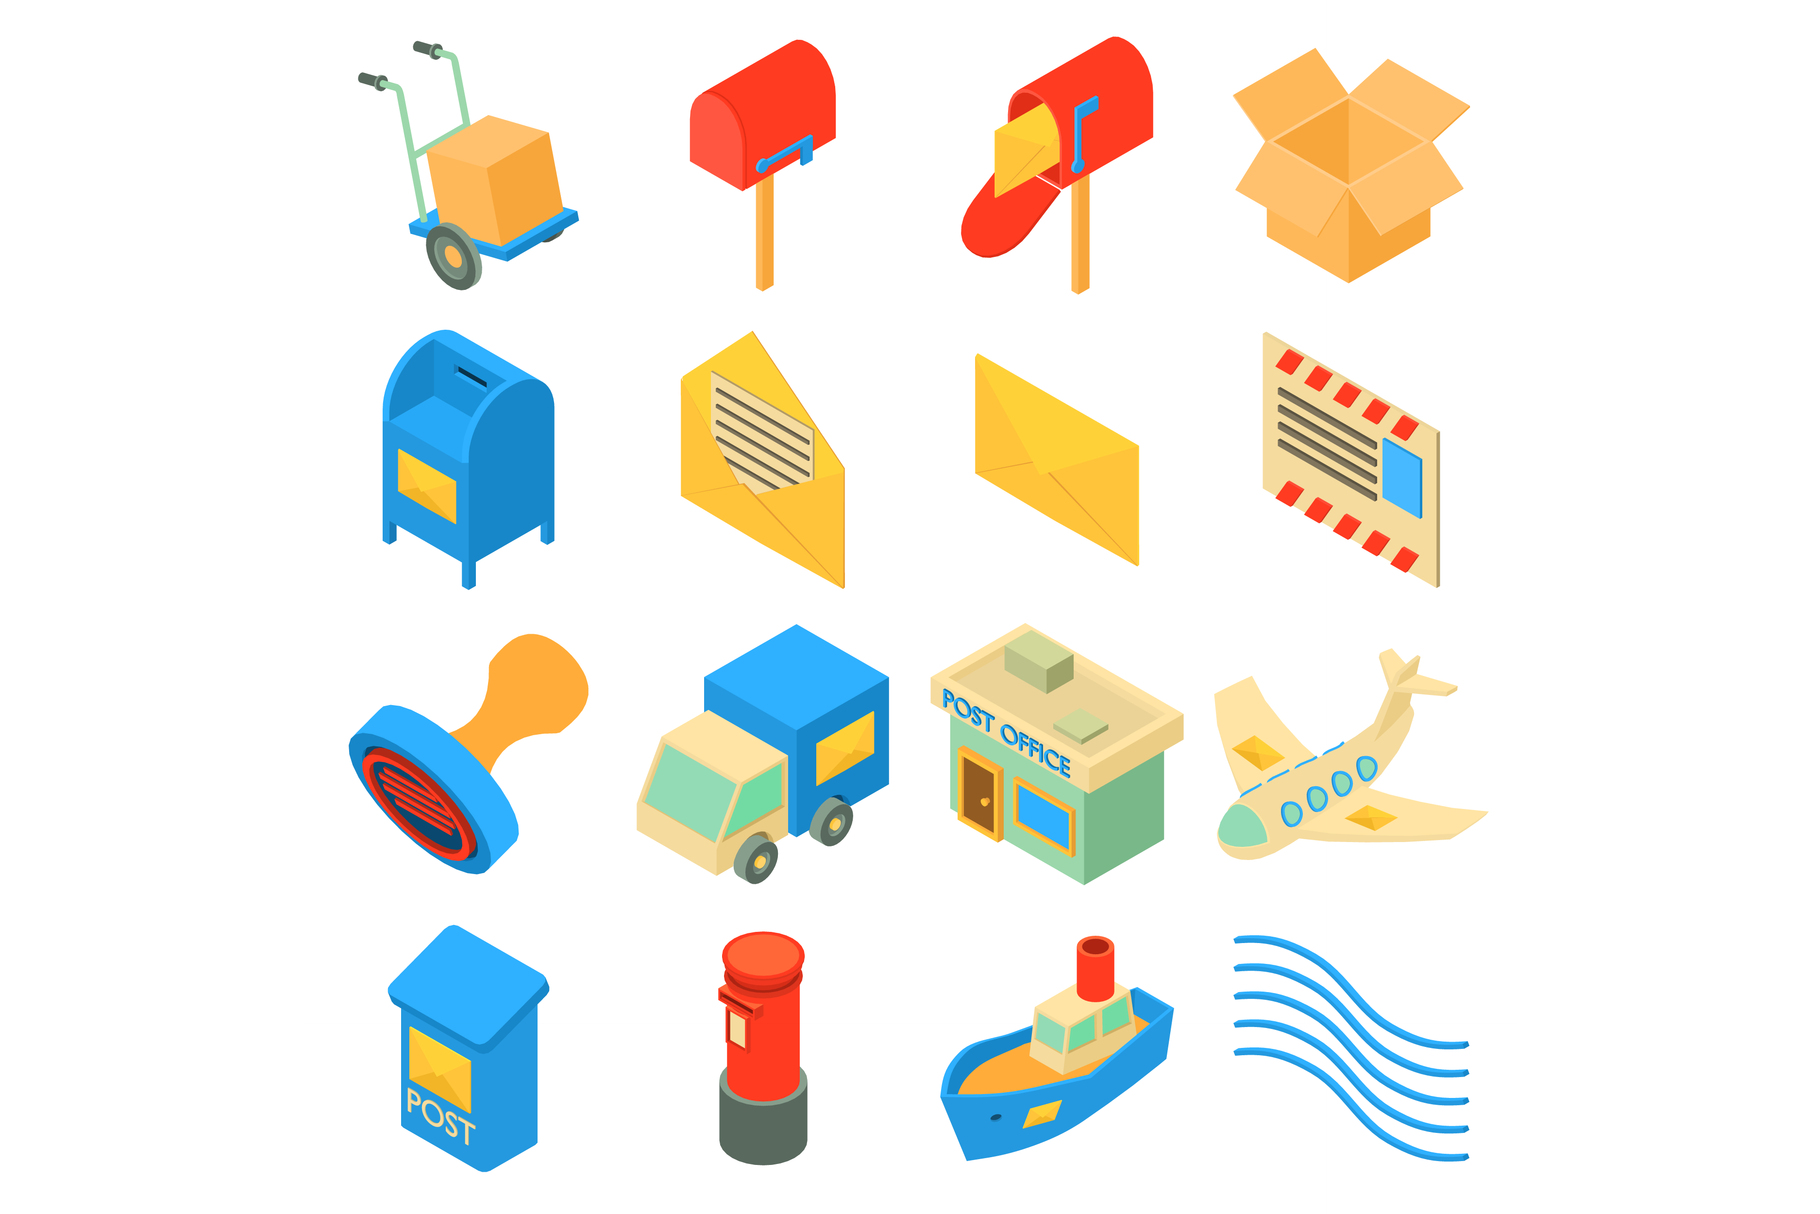 Poste service icons set, isometric style example image 1